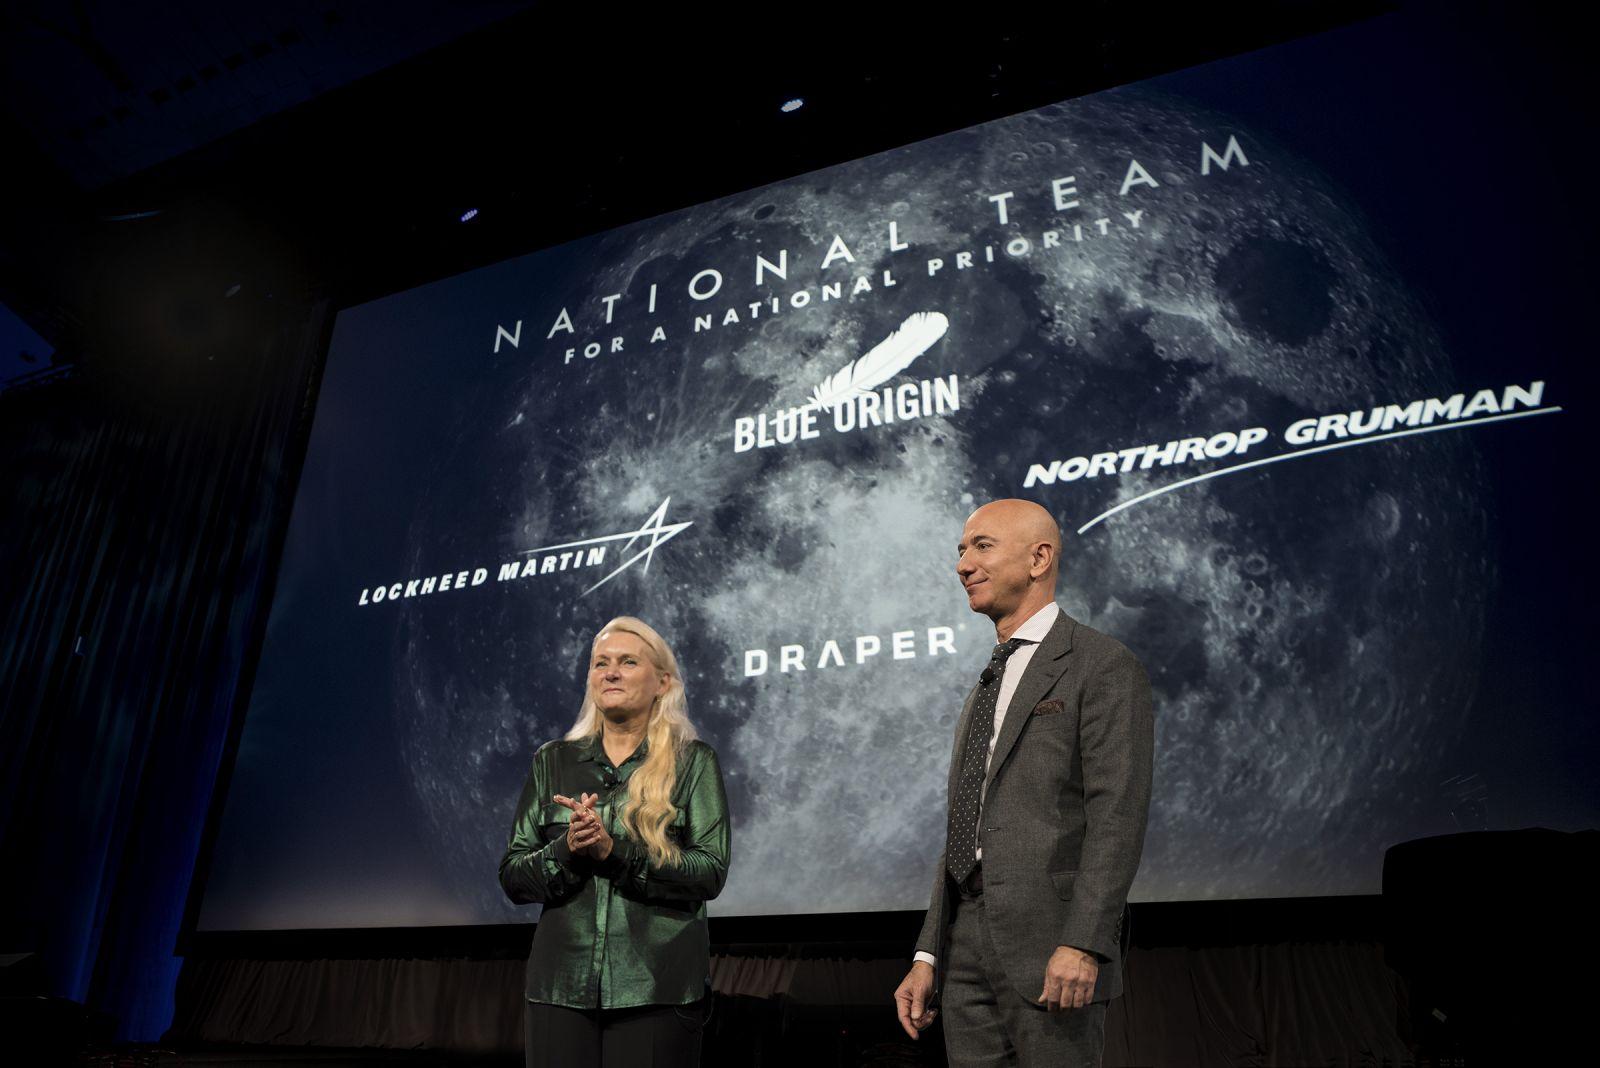 Bezos announces Blue Moon-based human lander team